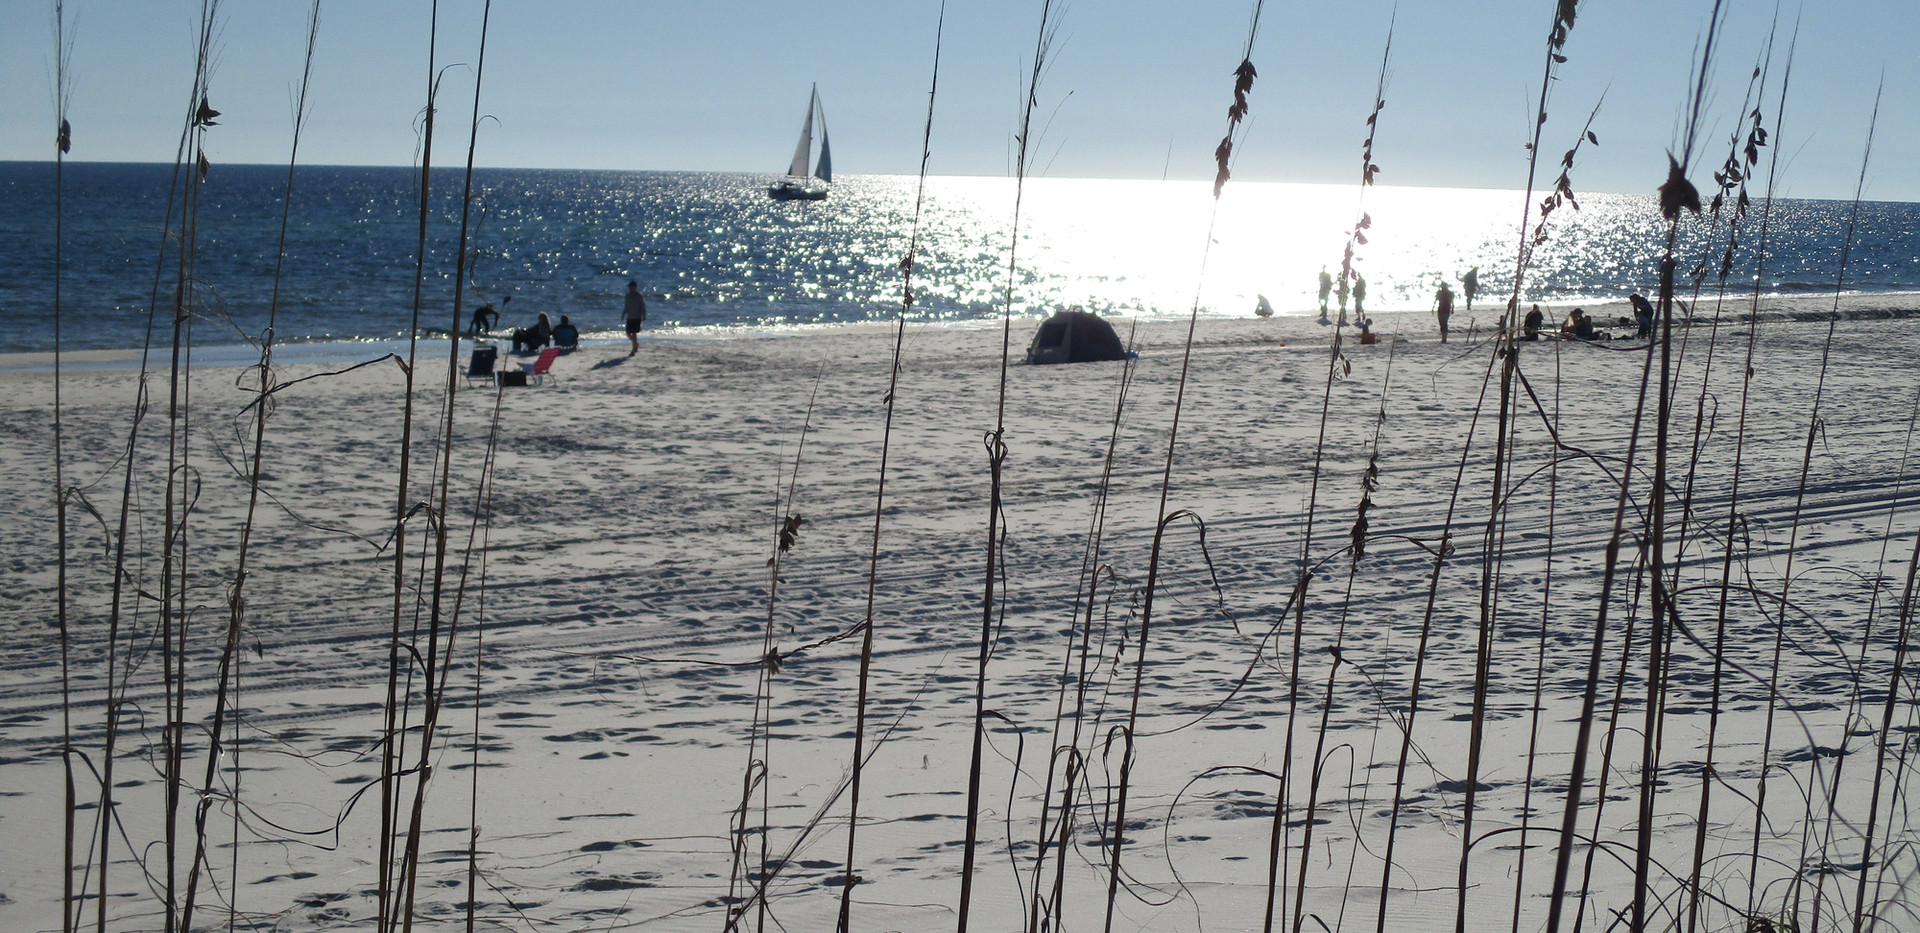 Beautiful sunny day on the beach!